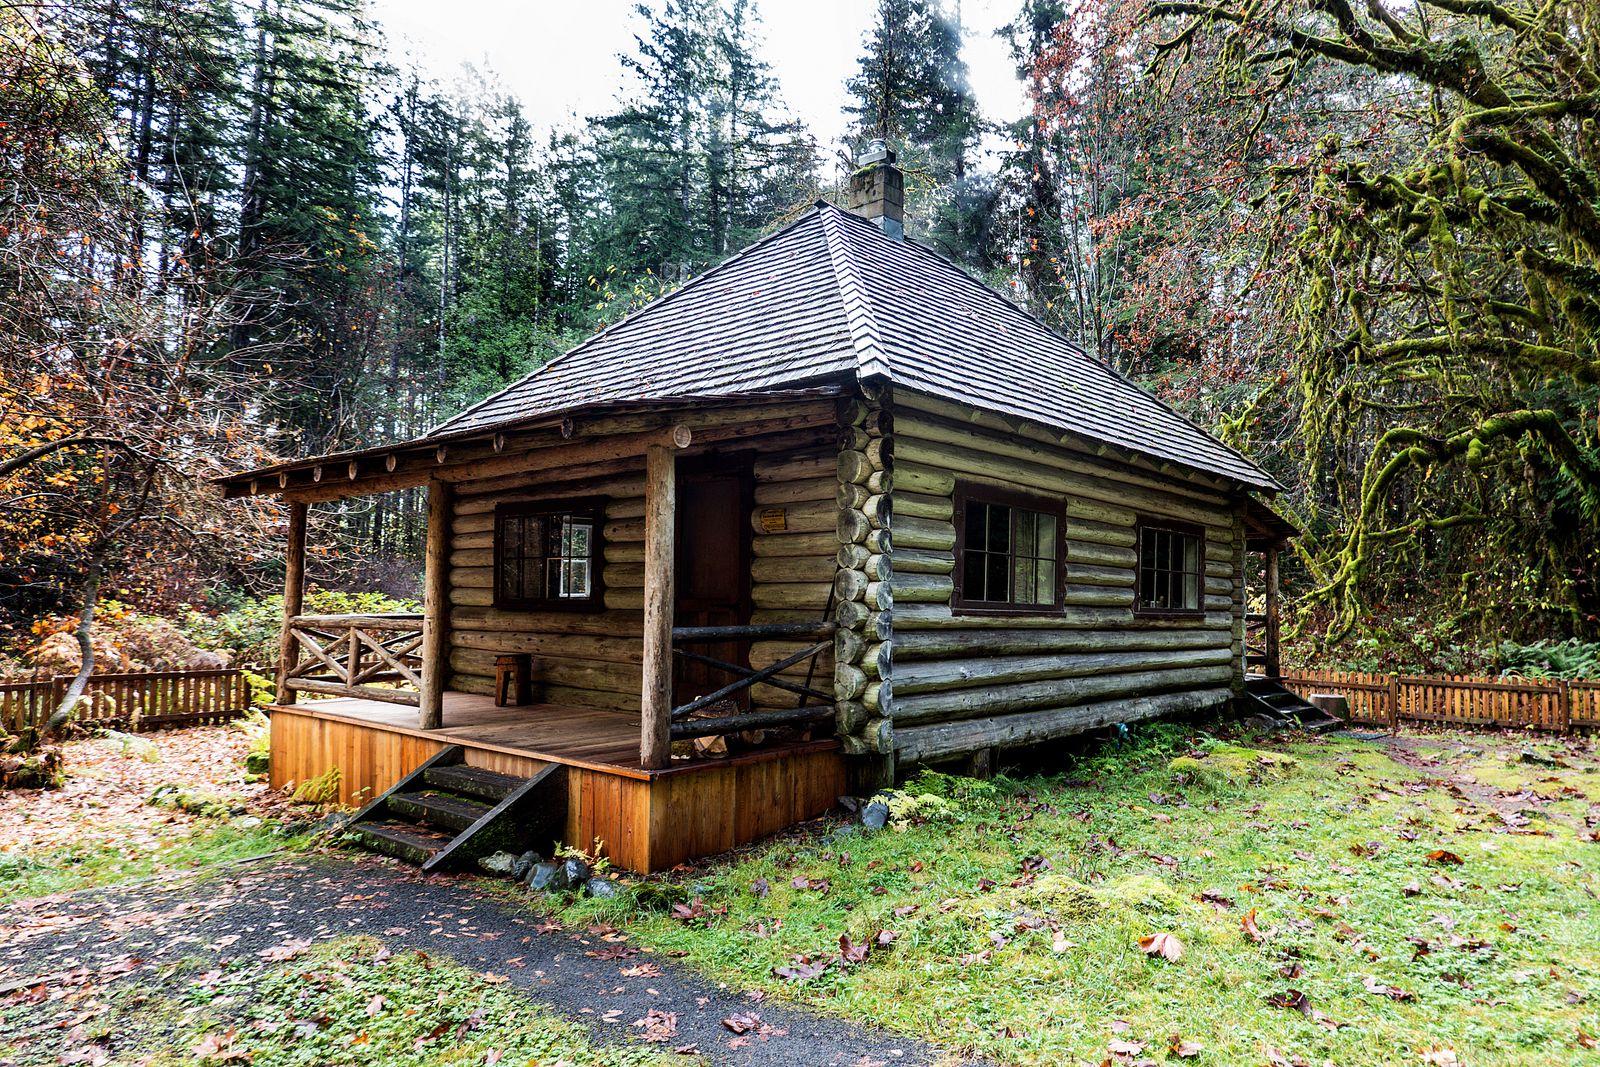 Park Service rental cabin on the way to Murhut Falls